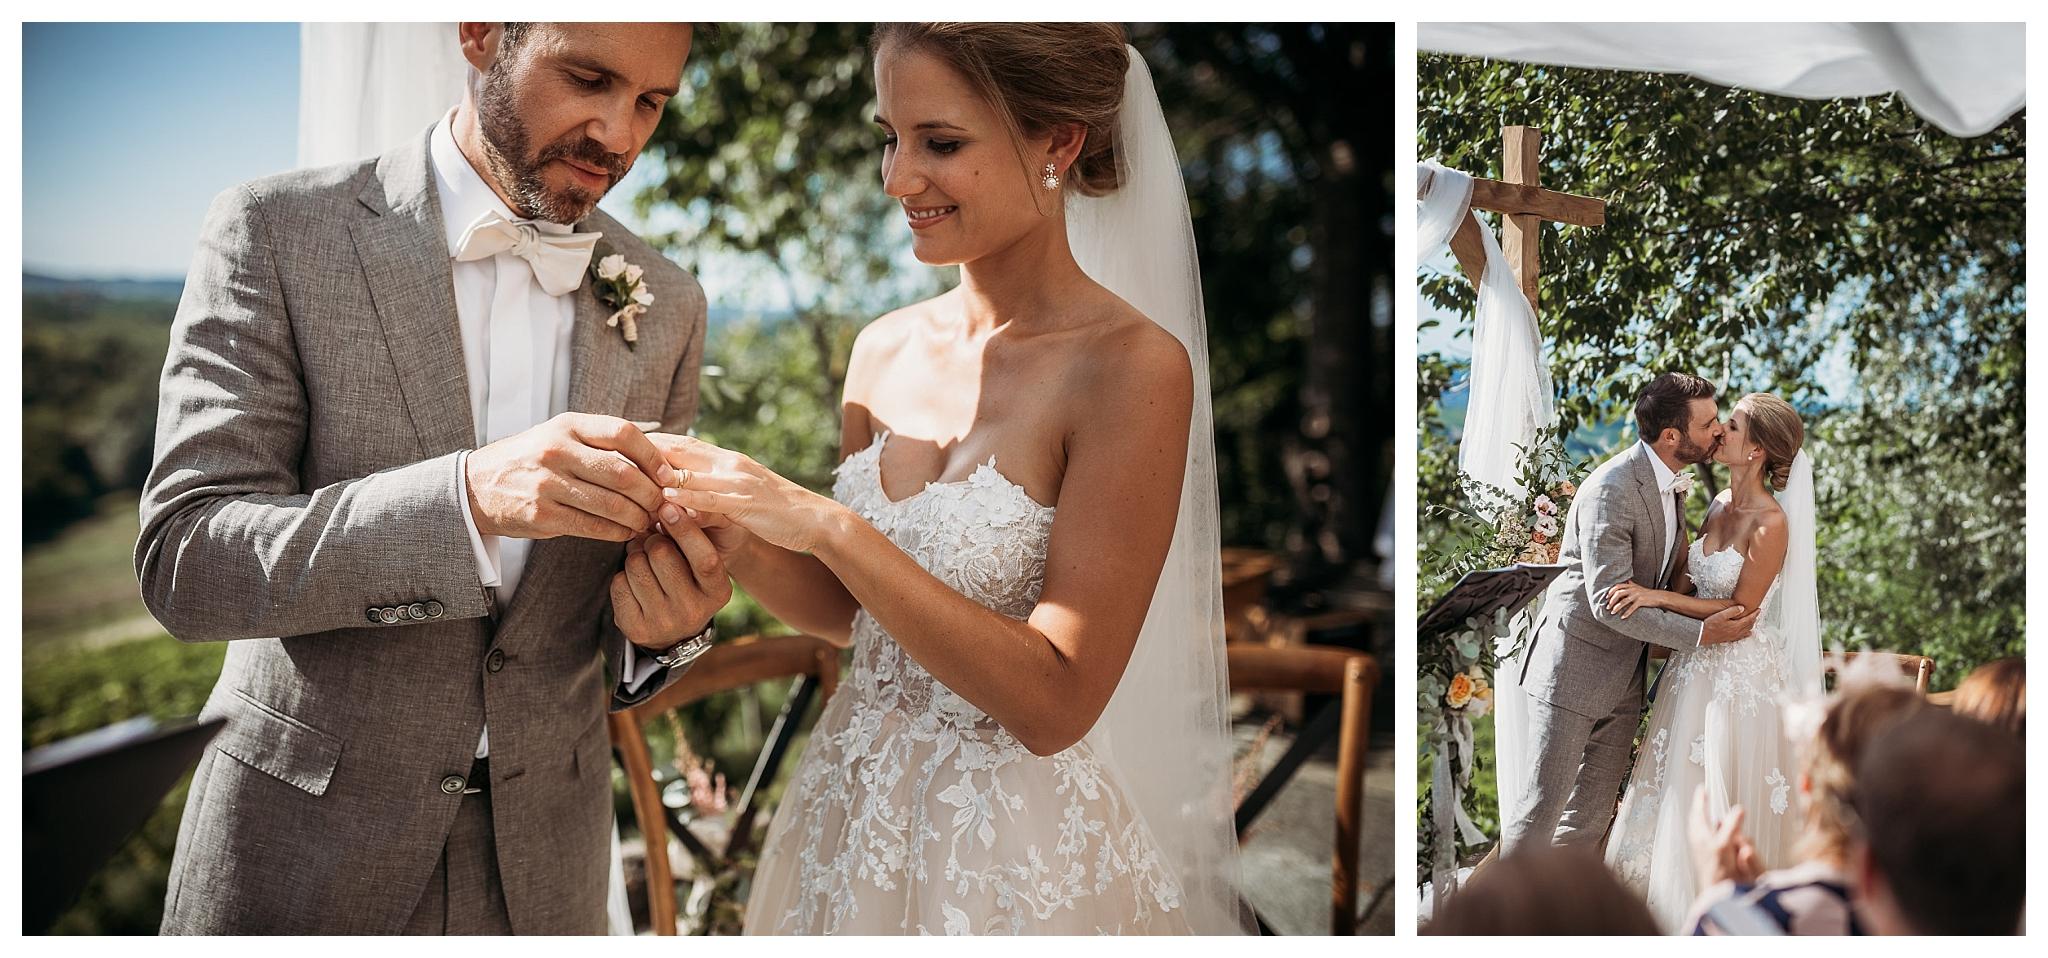 Wedding kiss at the ceremony at La Villa Hotel in Italy